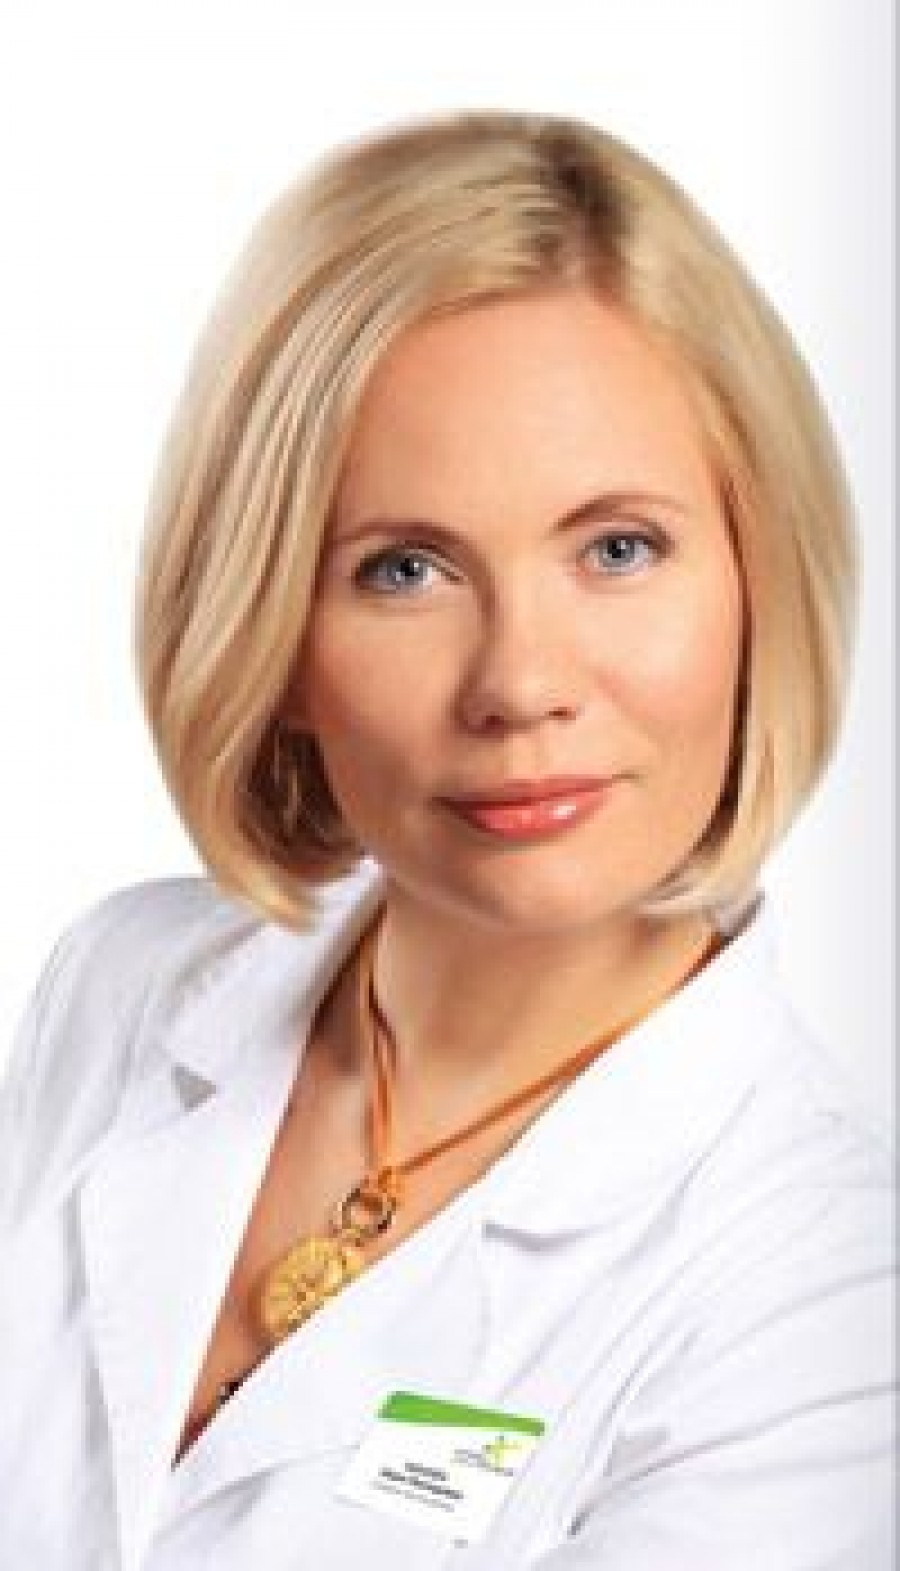 Шведский диетолог Анна Юхансон помогла многим звездам